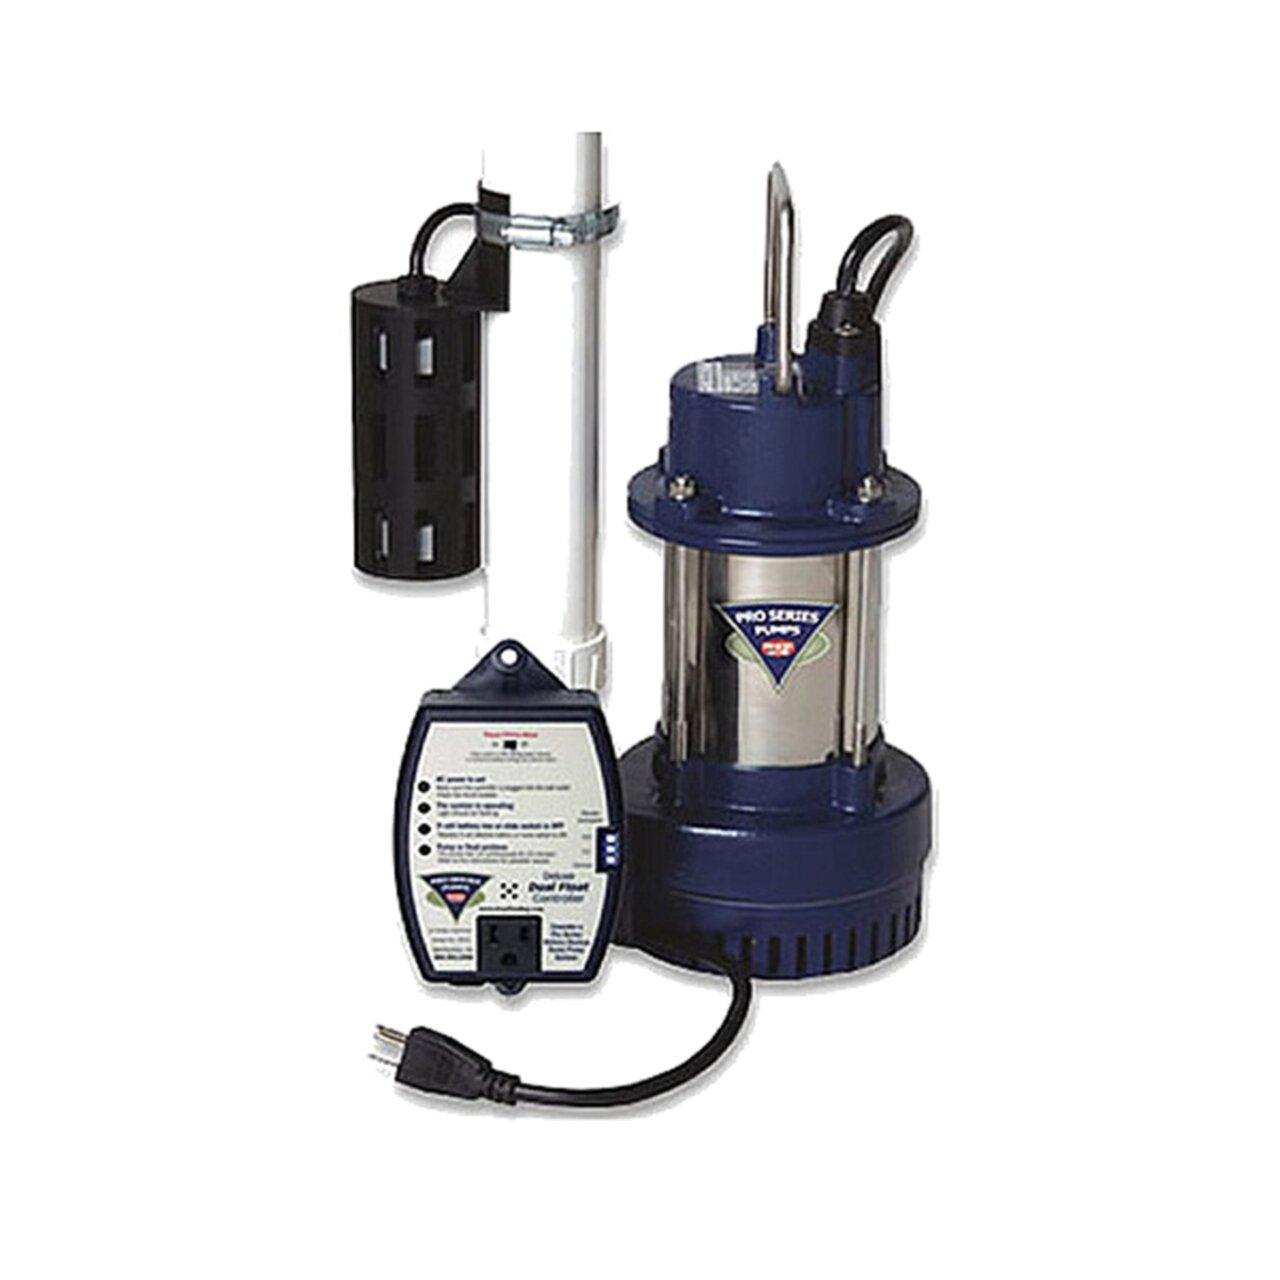 Glentronics Inc S3033 PHCC Pro Series 1//3 HP Sump Pump System 3000 Gallon Per Hour